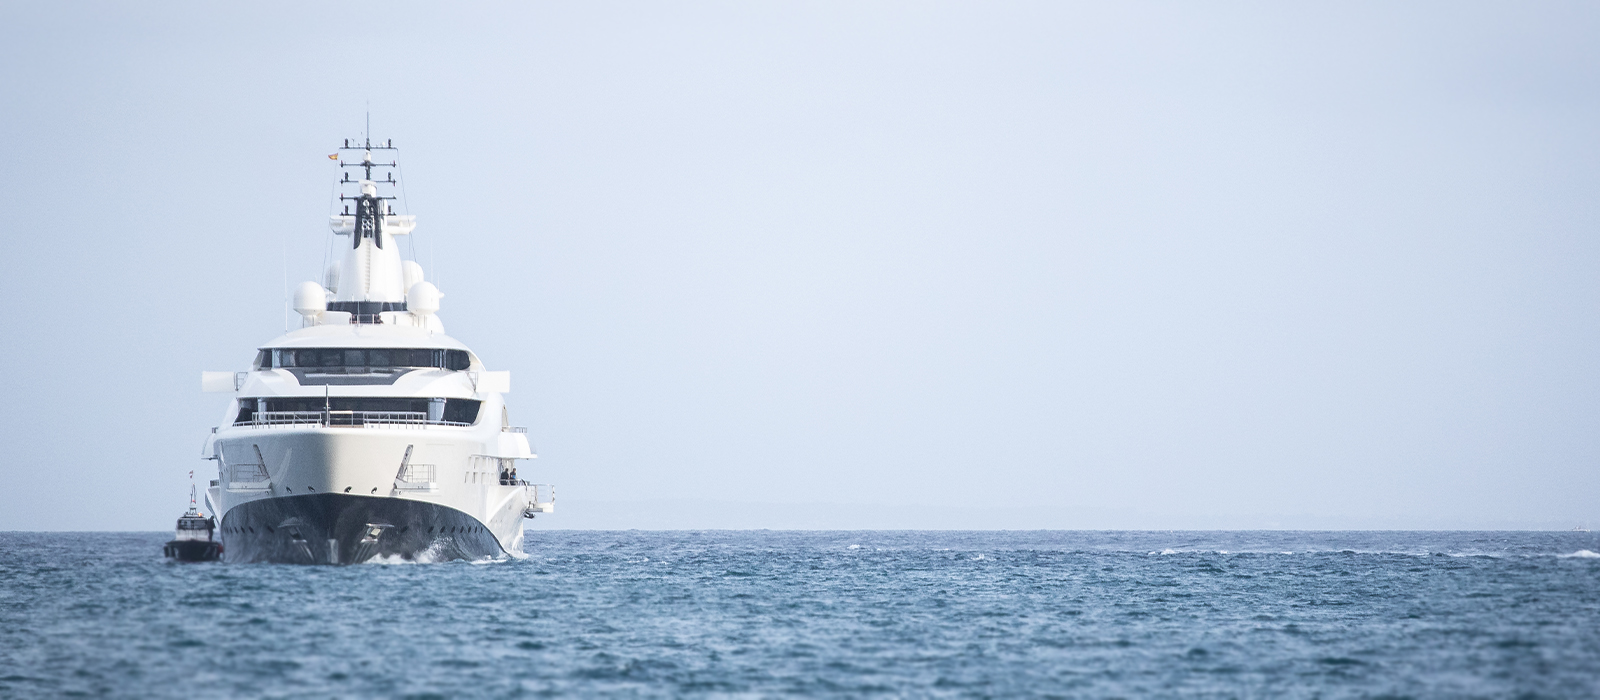 Protection-Indemnity-Insurance-Superyacht-Yacht-Luxury-Saxon-Brokers.jpg